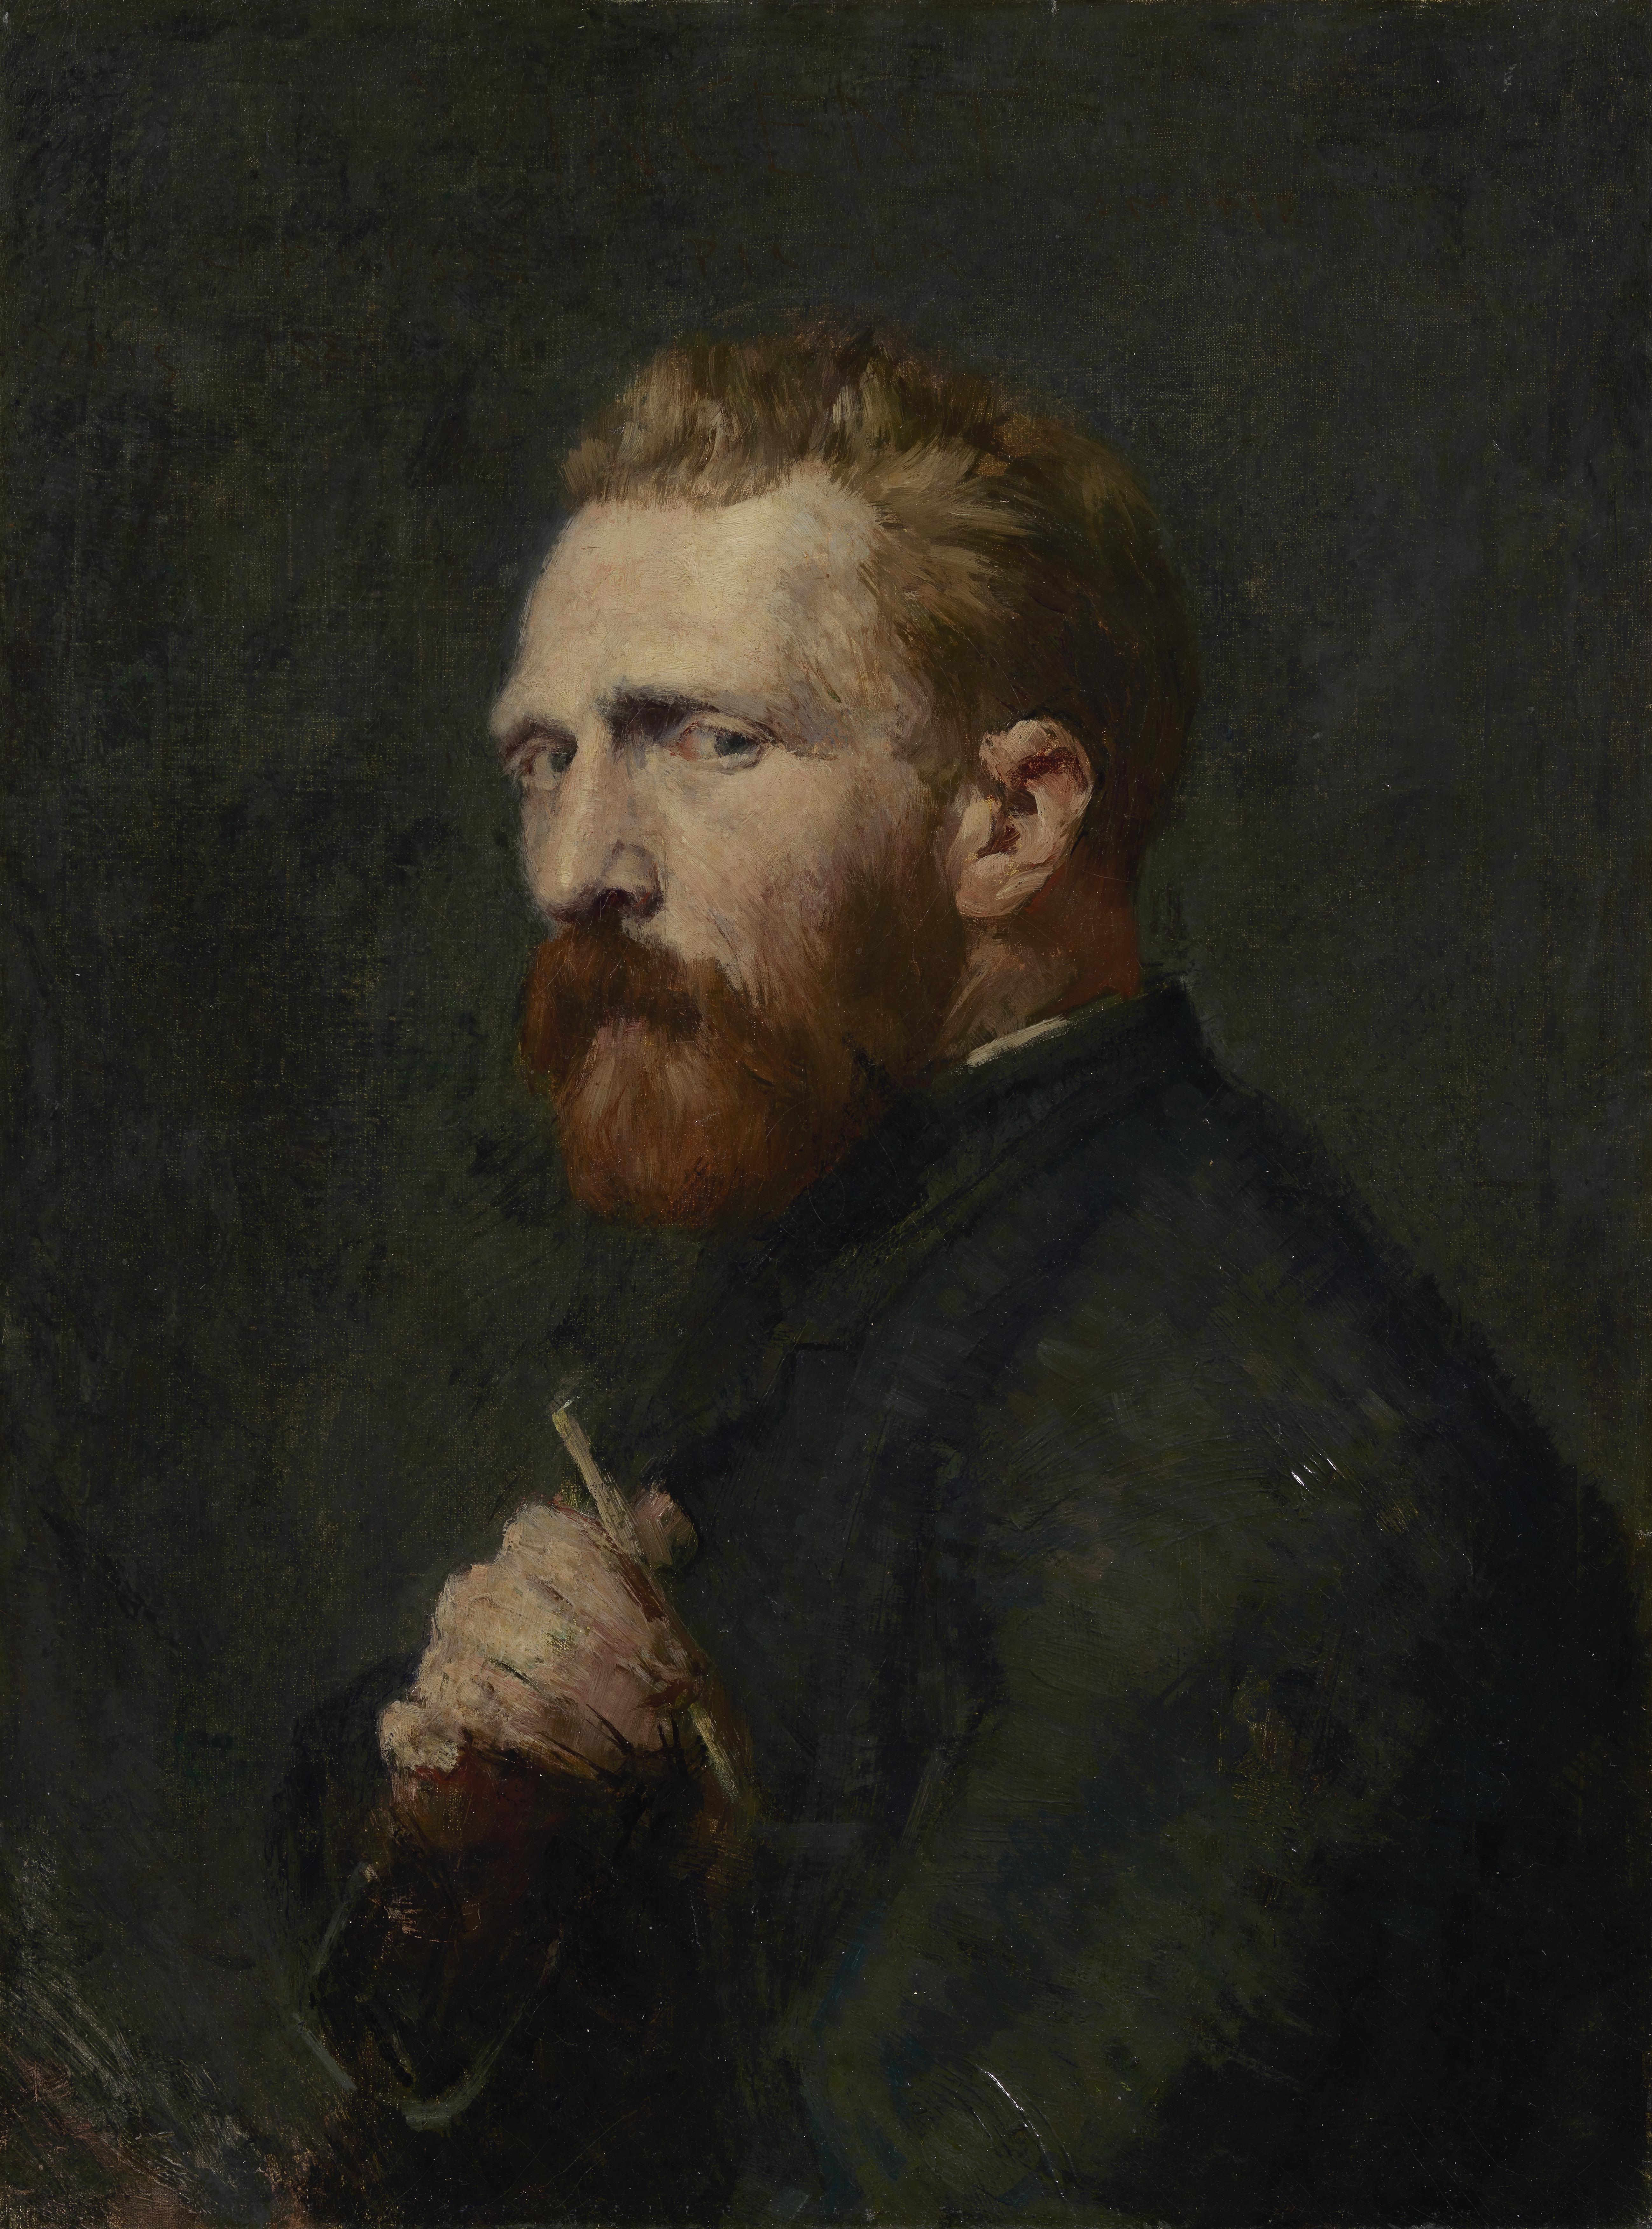 HD Quality Wallpaper | Collection: Artistic, 5194x7007 Vincent Van Gogh